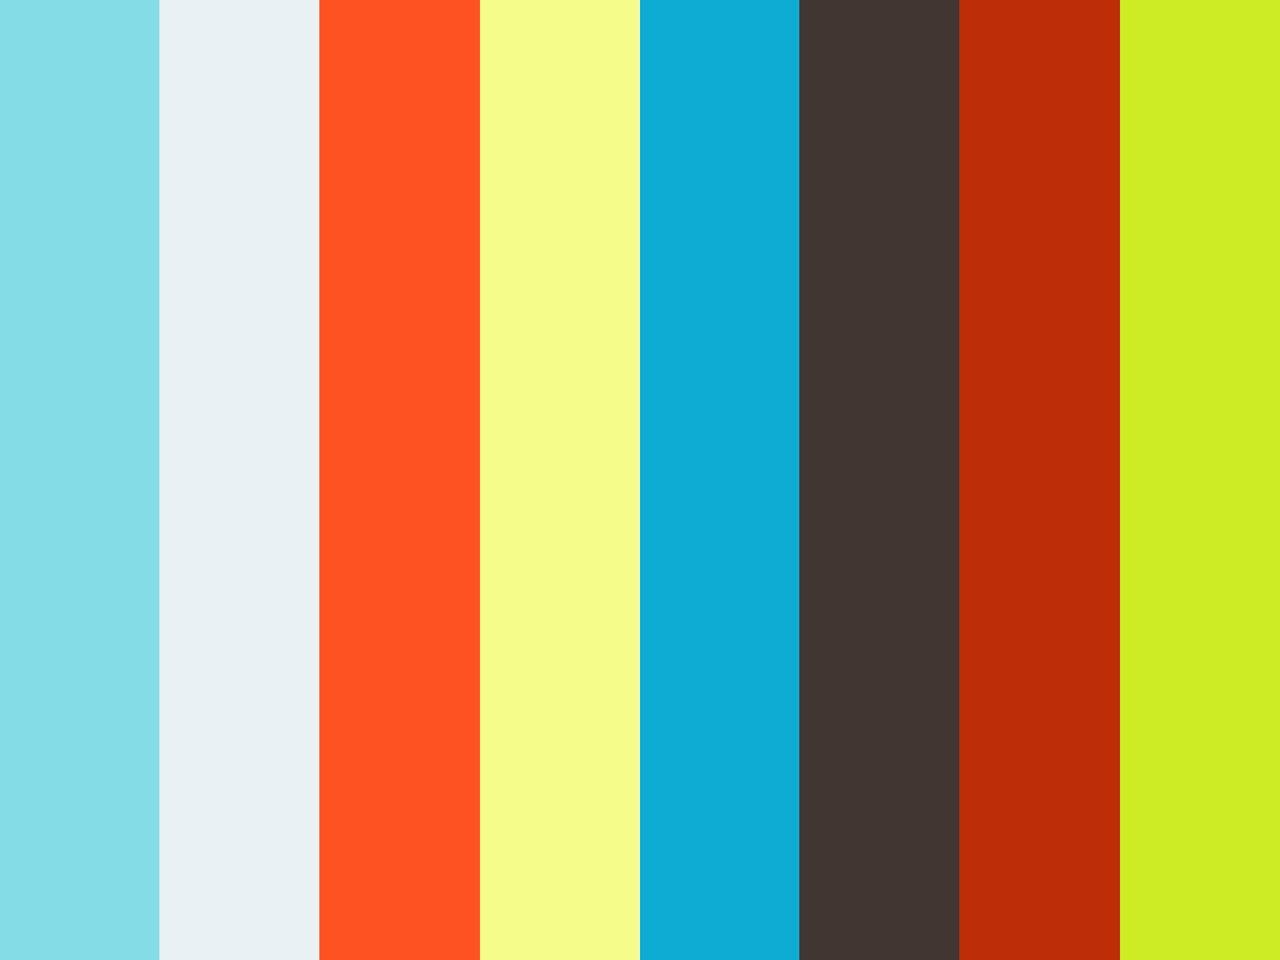 CG Generalist / Lighting / Environment | Thomas Némery | SUPINFOCOM showreel